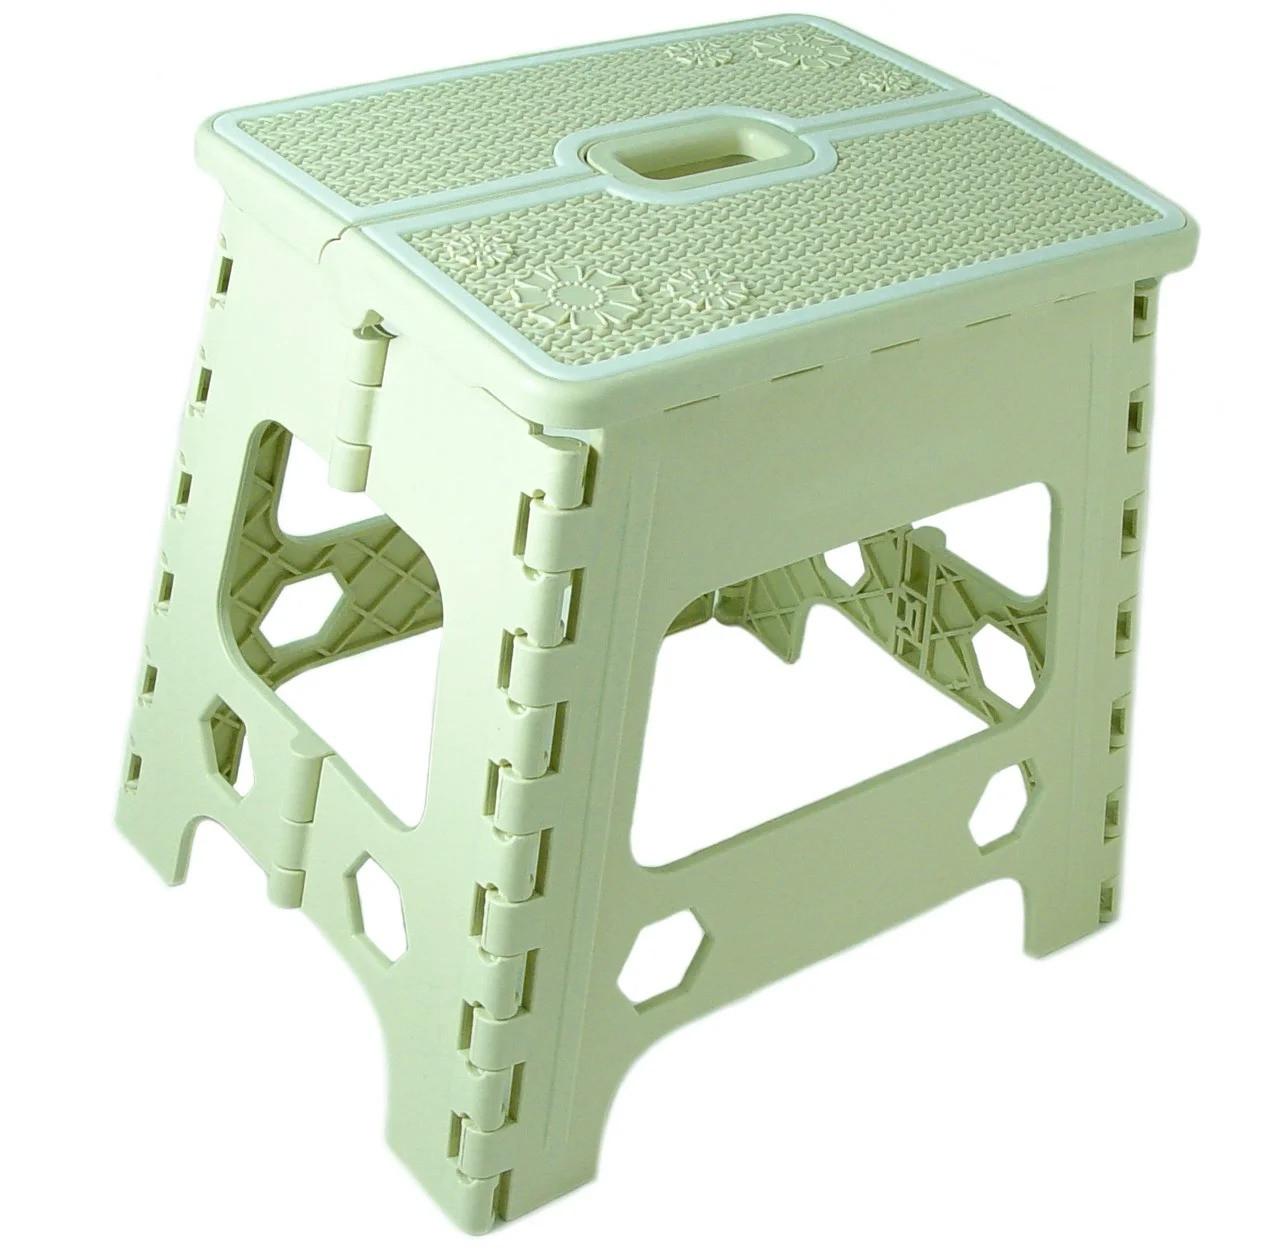 Табурет раскладной Stenson R87943 30х25х30 см, зеленый